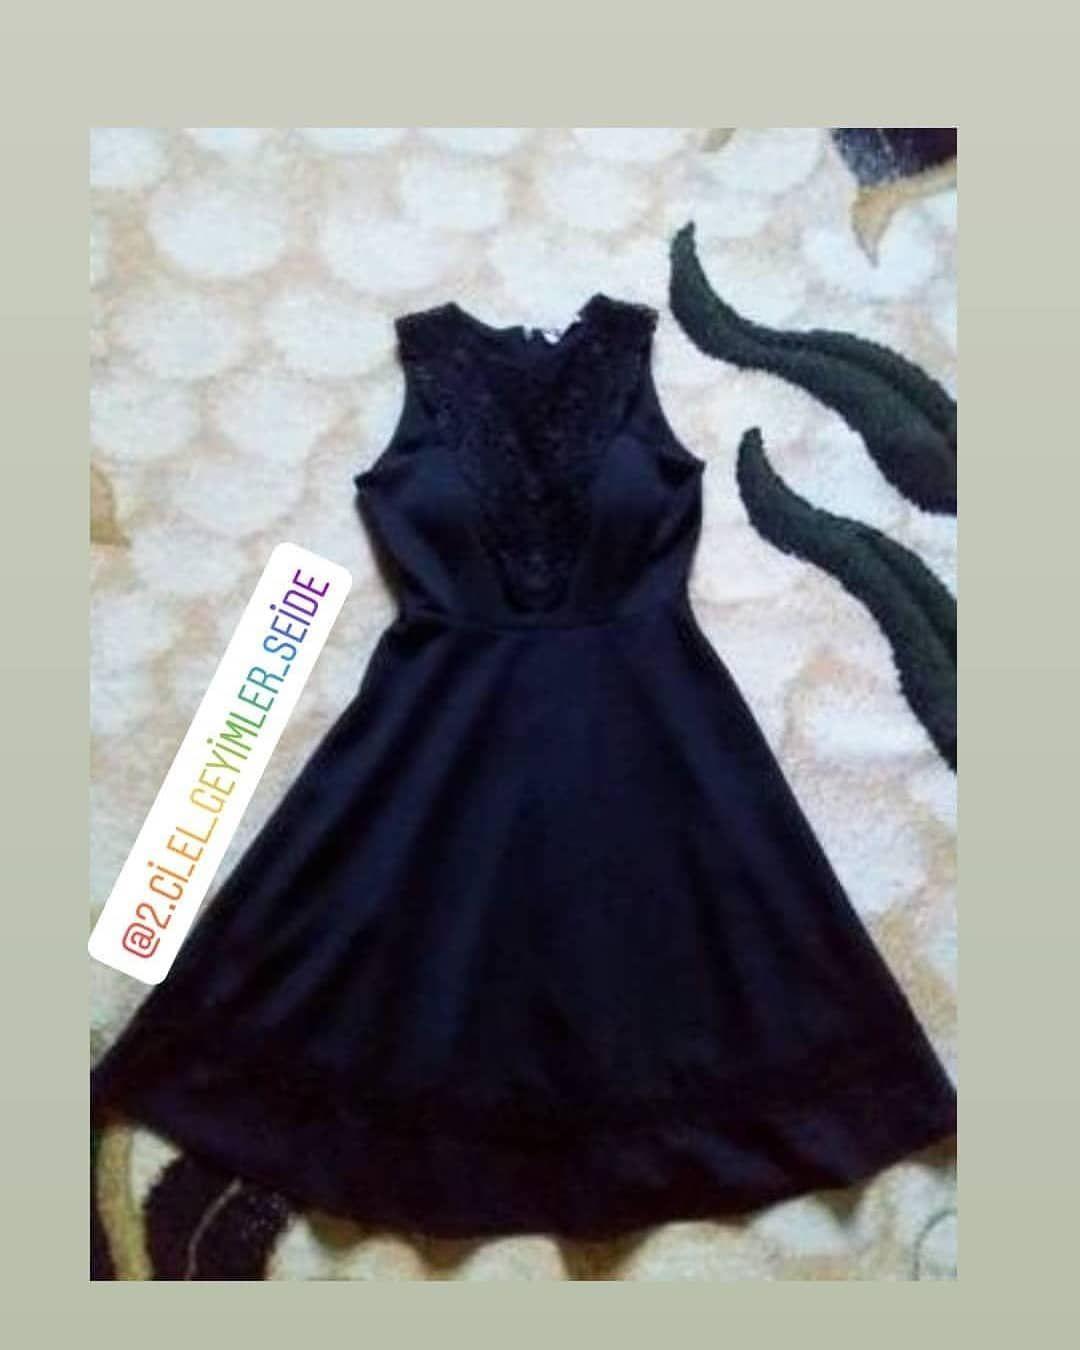 30 Manat M Razmer 2 Defe Geyinilib 2 Ci El Geyimler Seide ətrafli Məlumat Ucun Dm 129 Ayaqqabi Little Black Dress Halter Formal Dress Black Dress